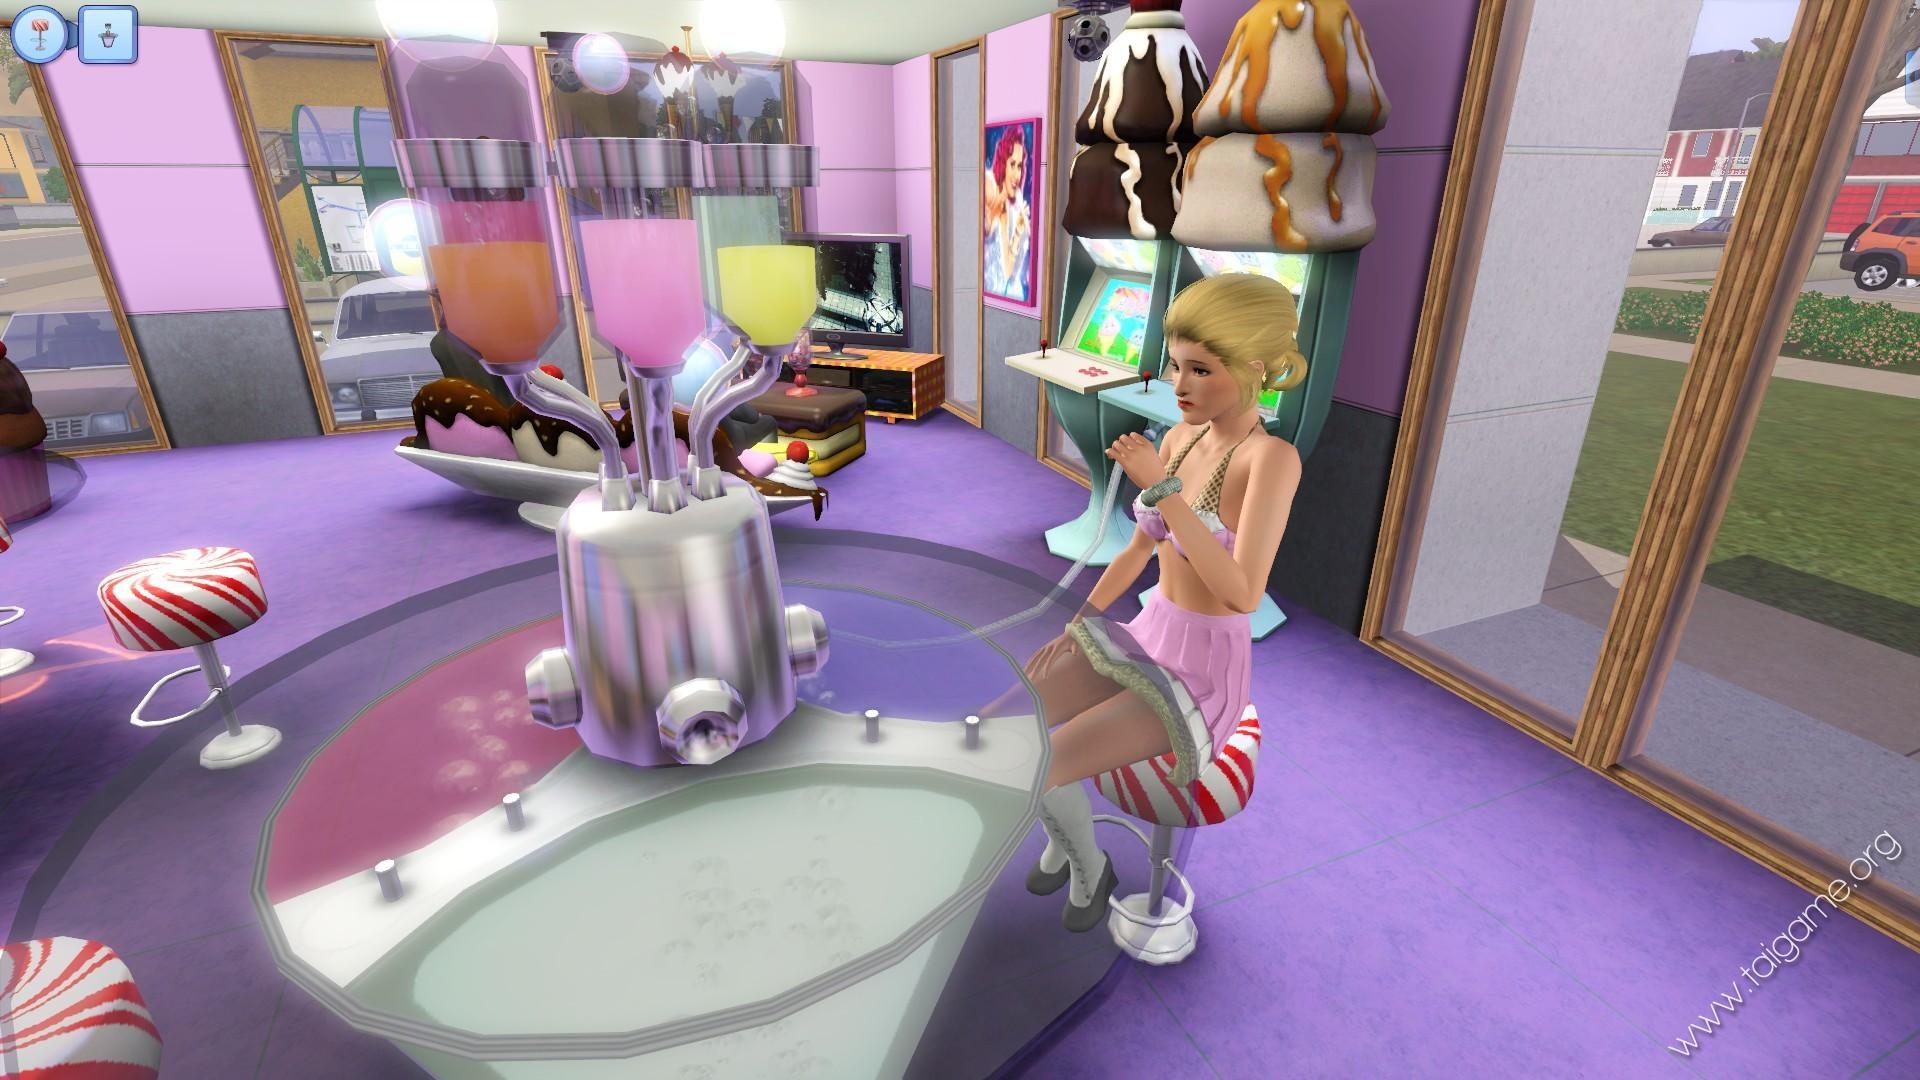 The Sims 3 - Katy Perry's Sweet Treats Help